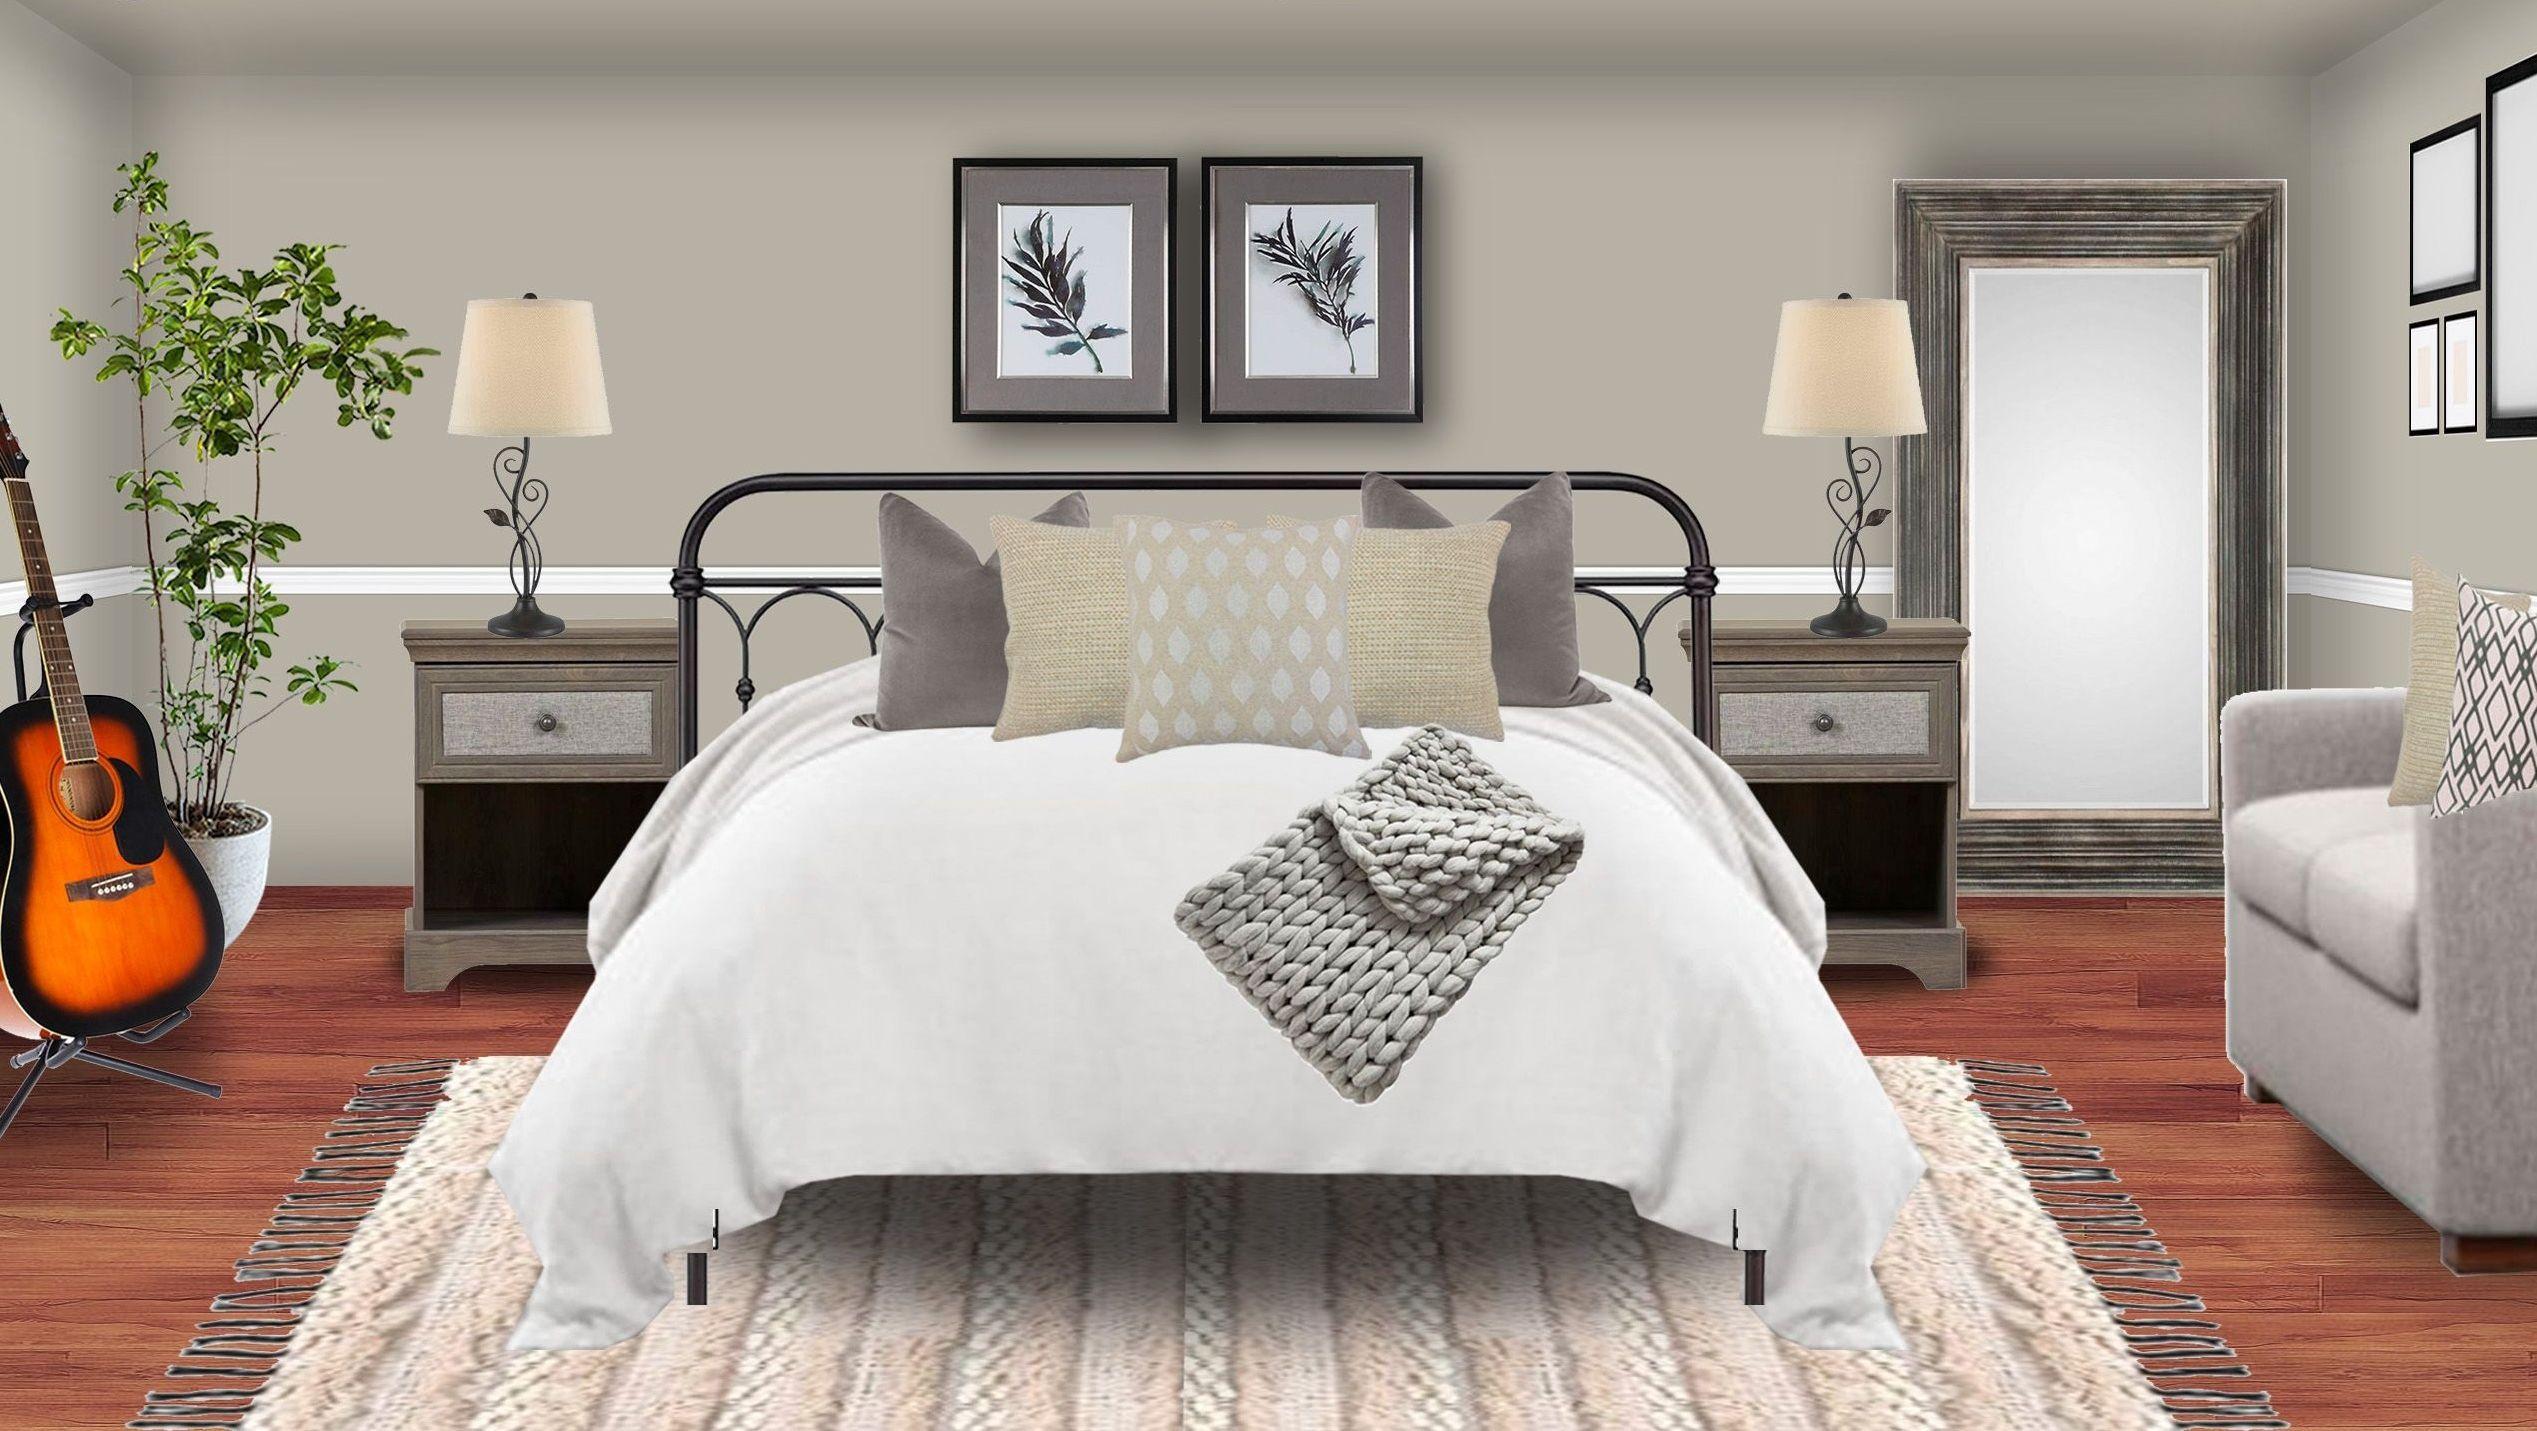 15 Modern Coastal Bedroom Design Ideas You'll Want to Try   Transitional bedroom  design, Bedroom design, Coastal bedroom